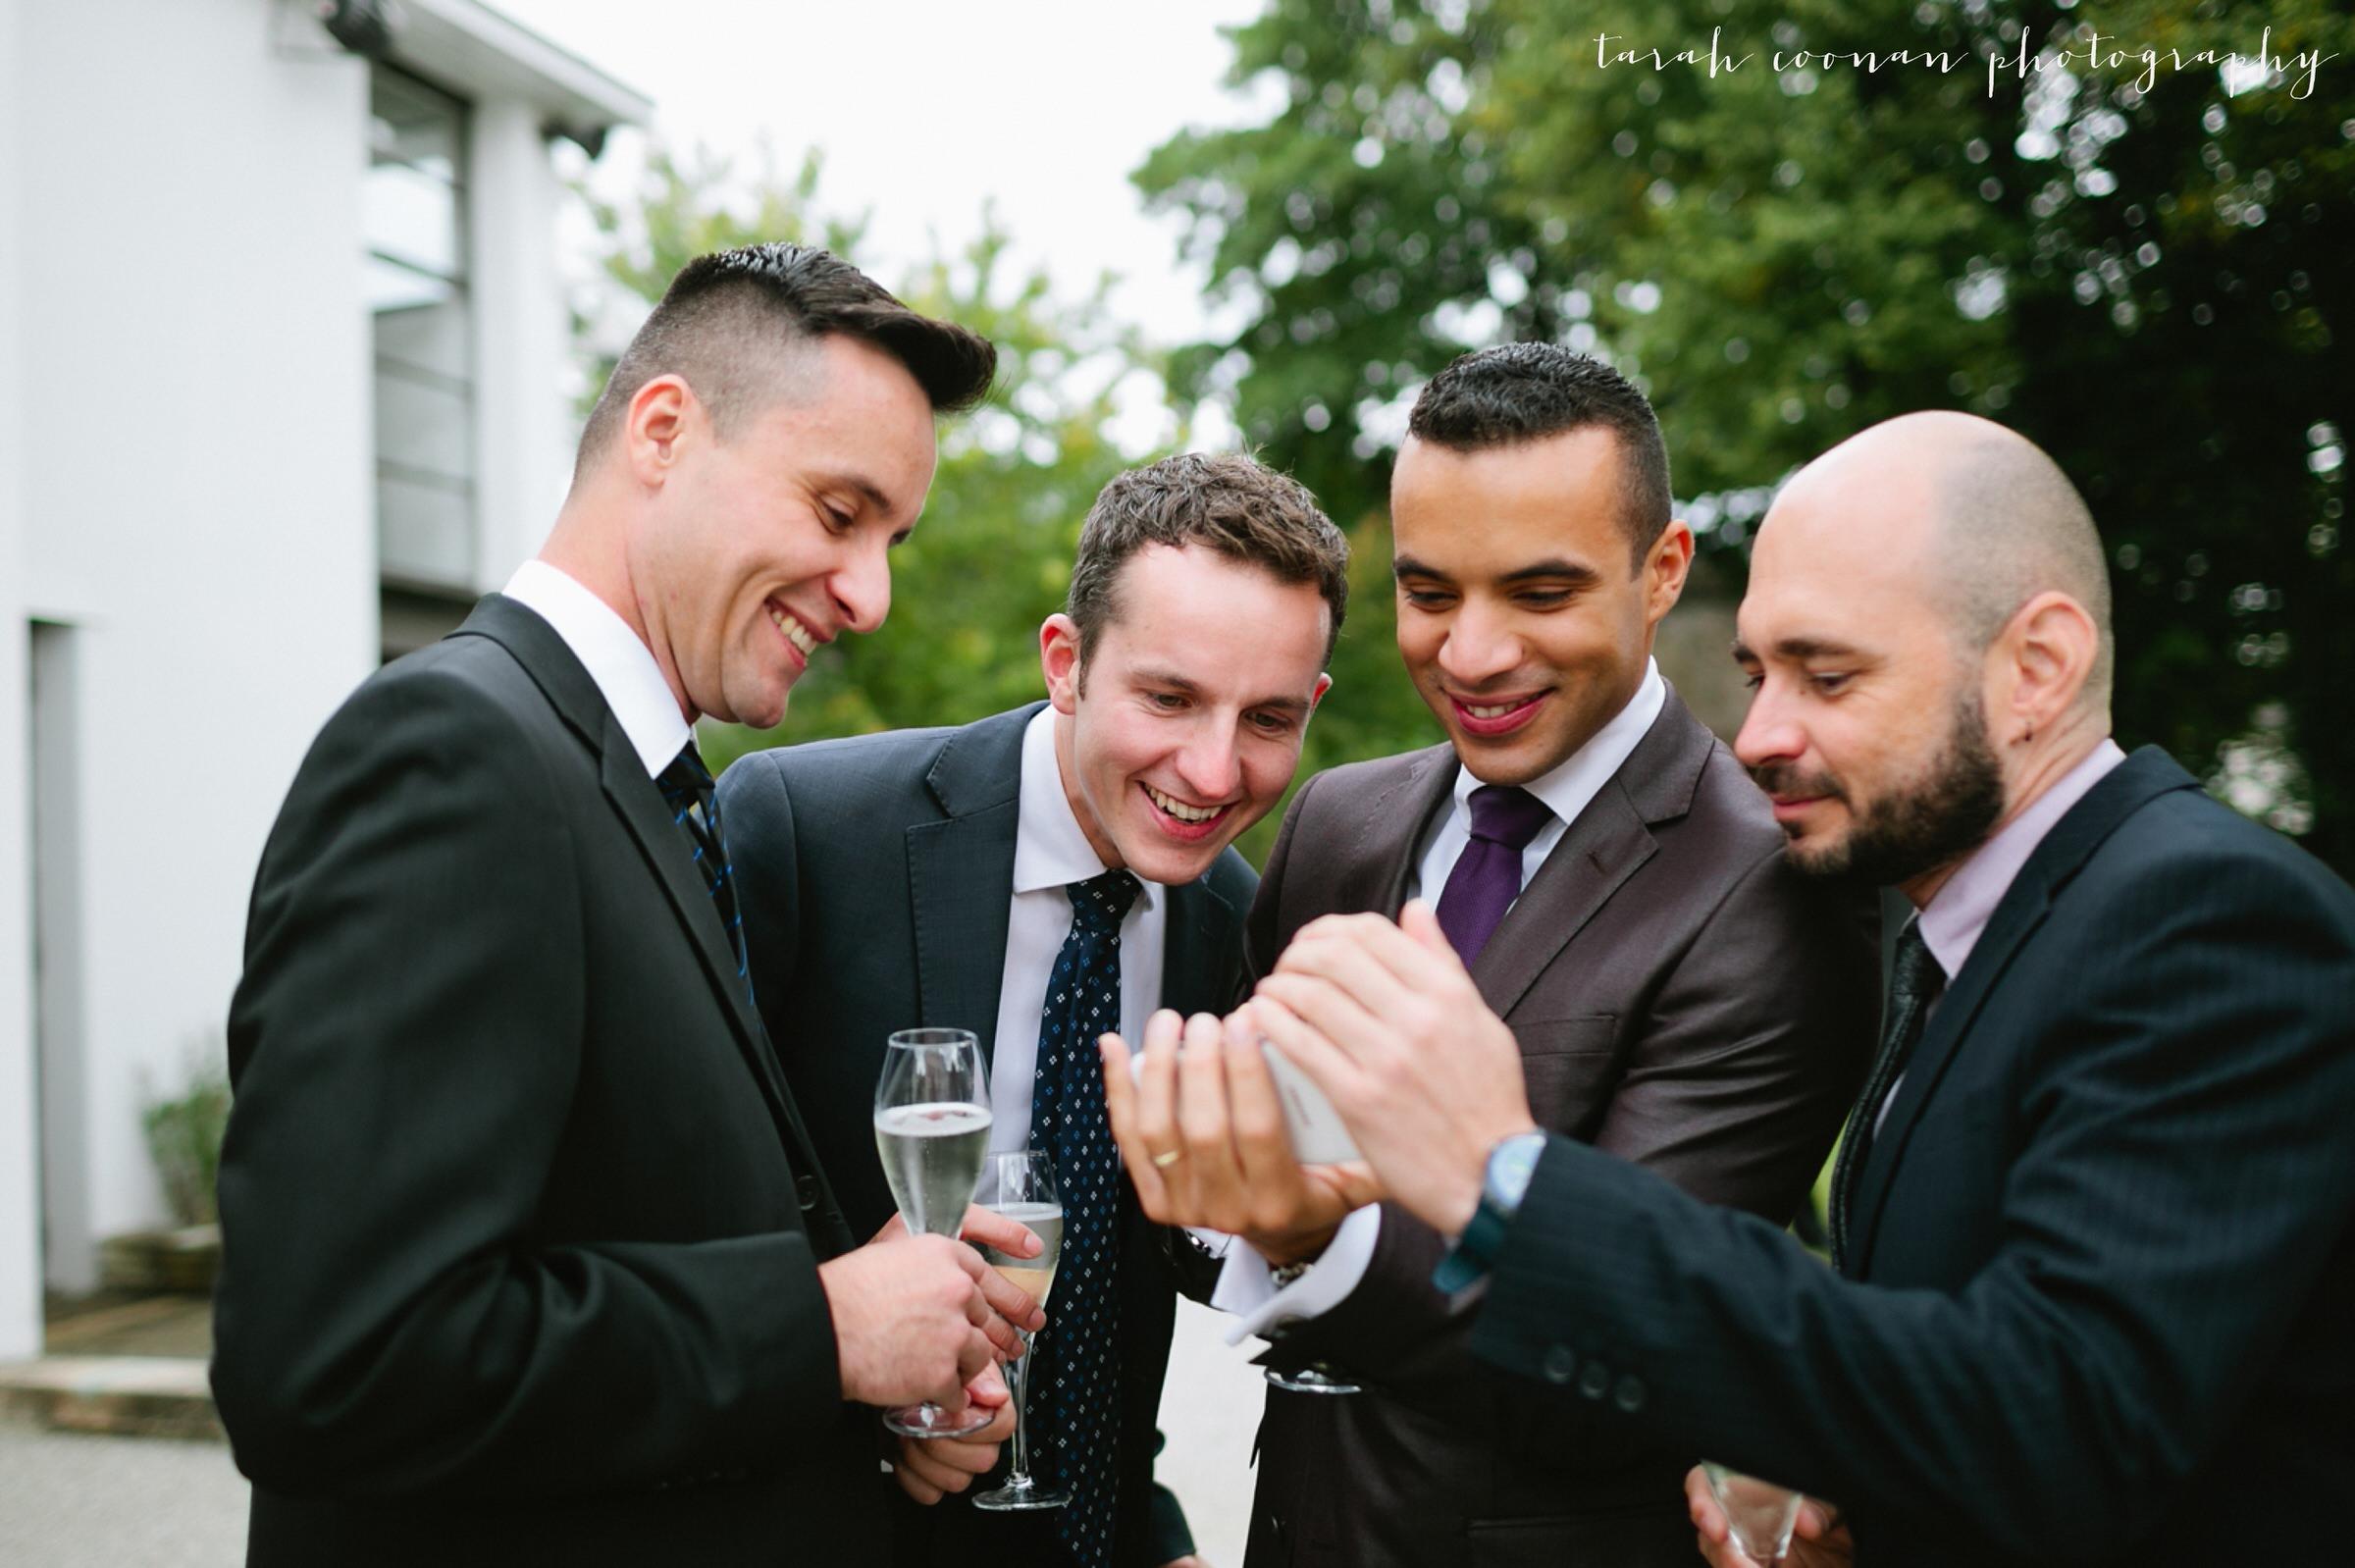 birmingham-wedding-photographer_057